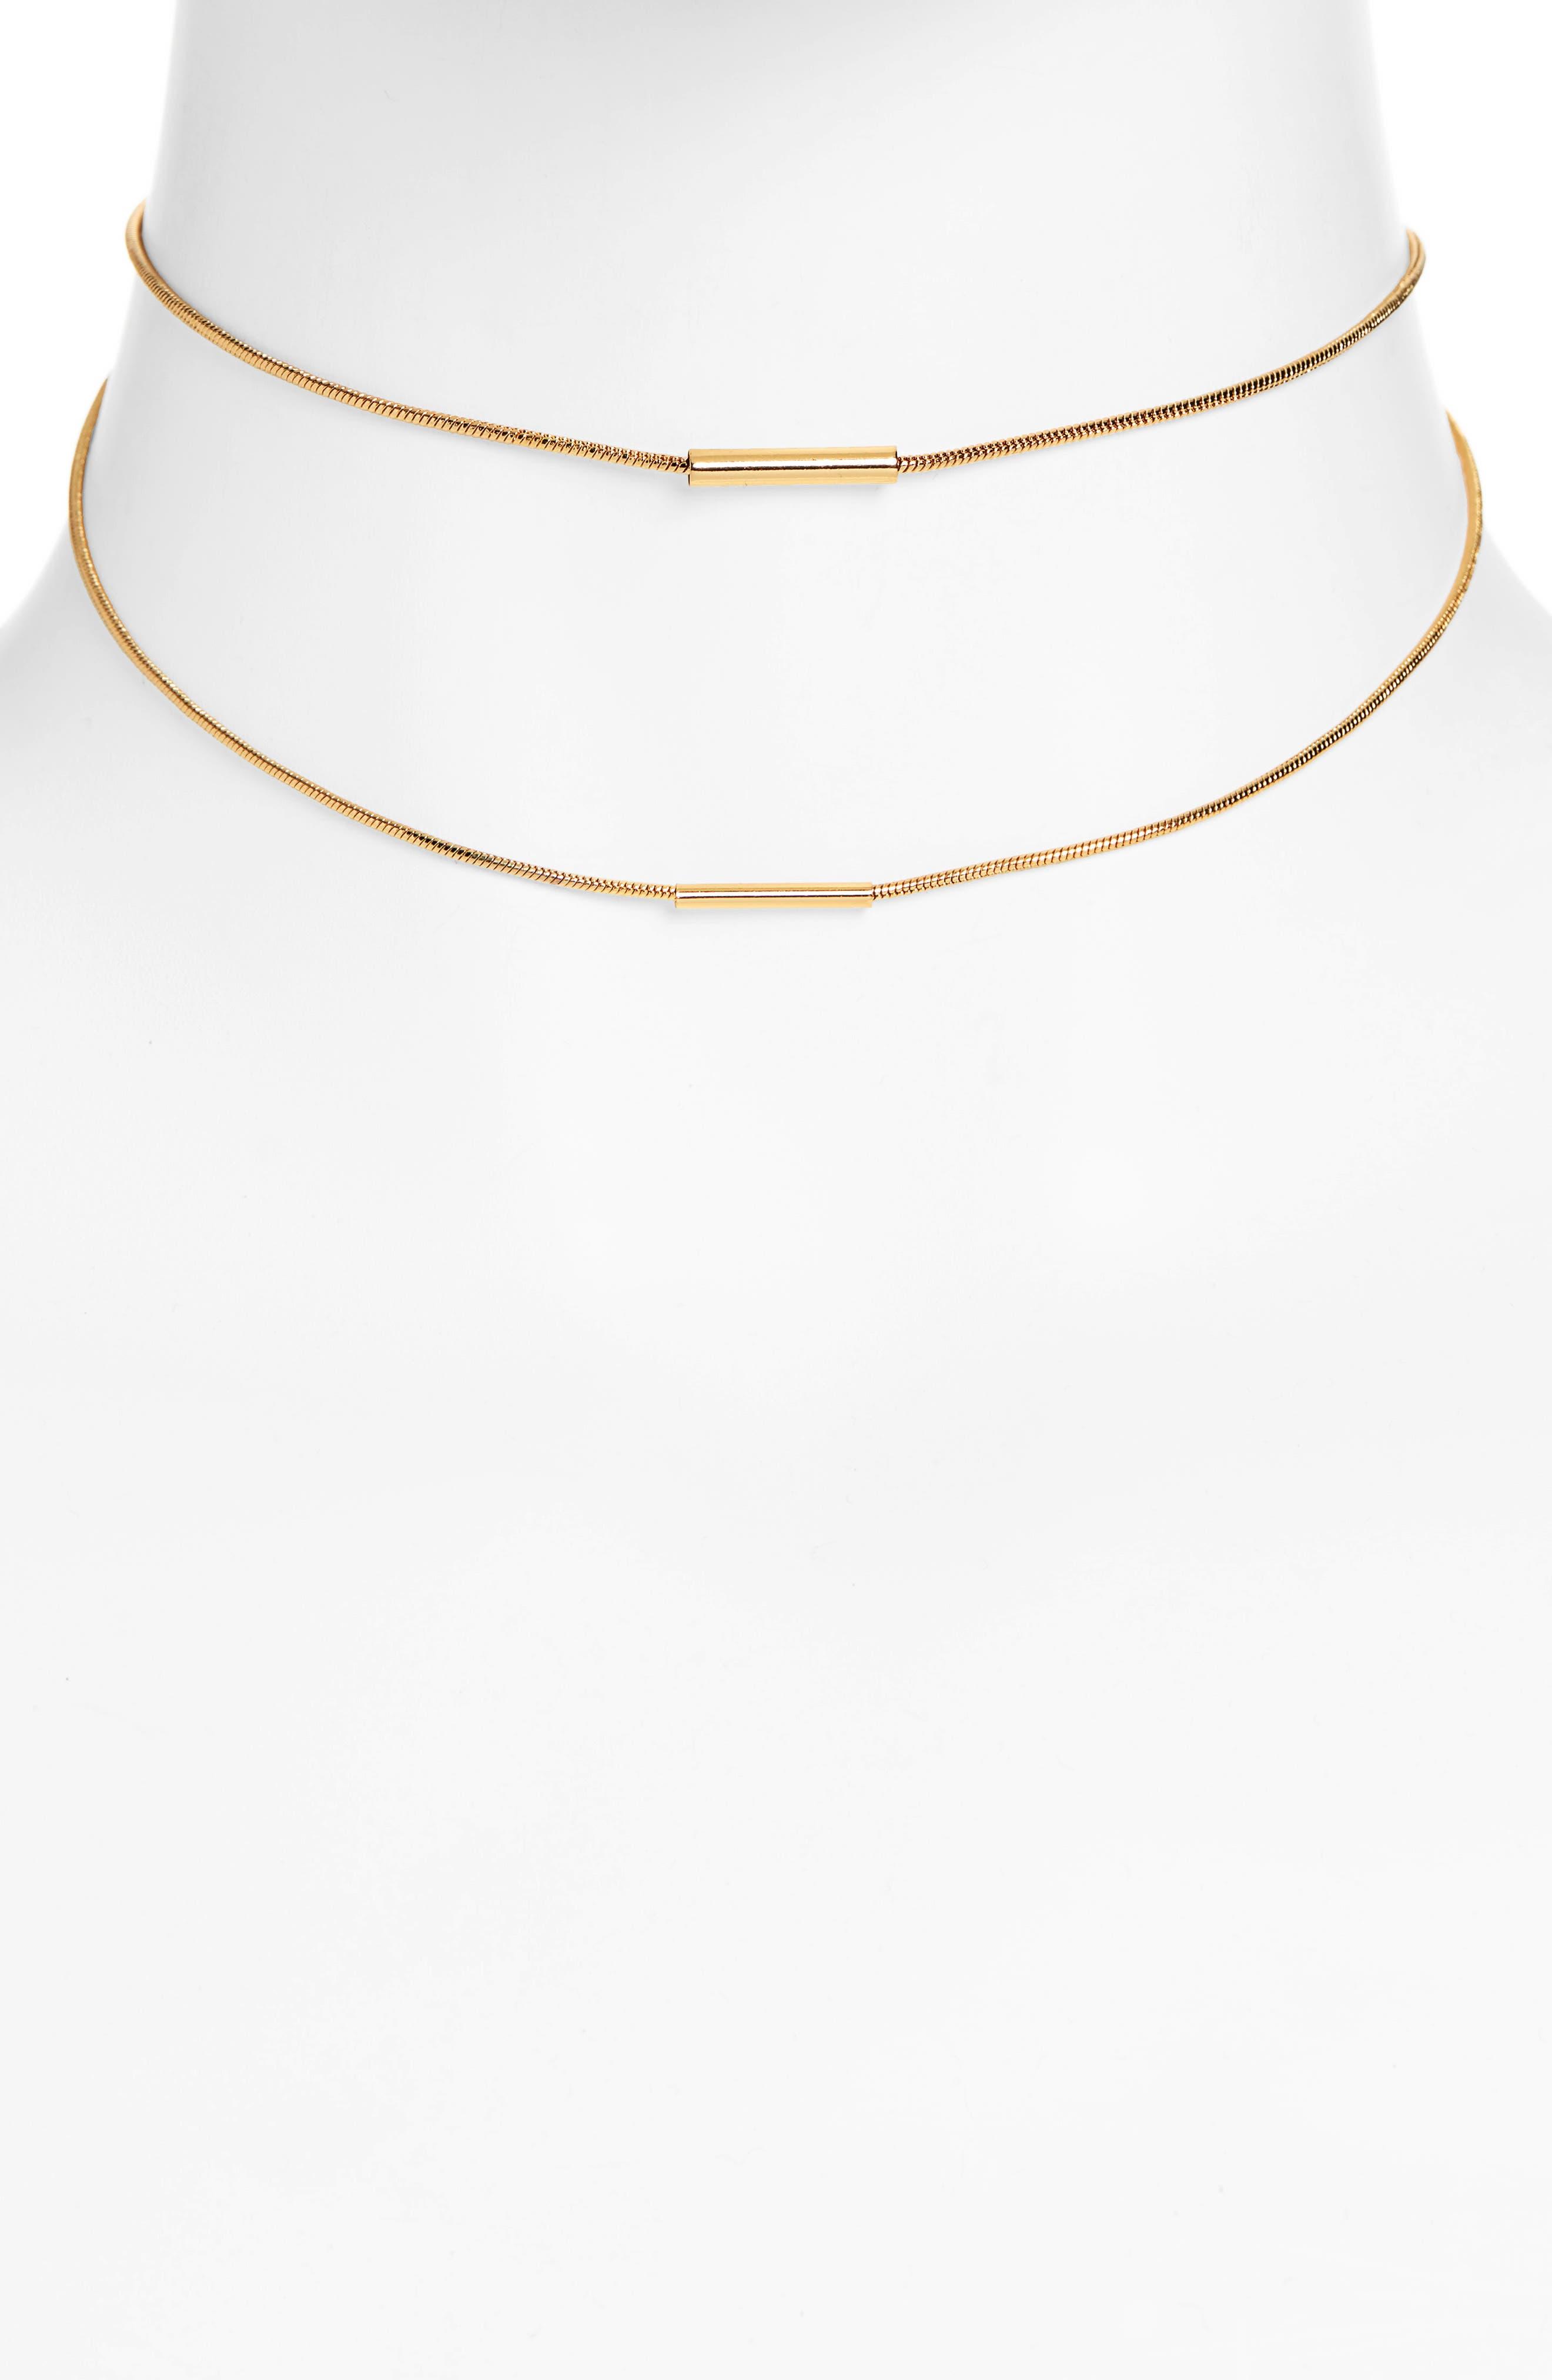 UNCOMMON JAMES BY KRISTIN CAVALLARI Tennessee Multistrand Necklace, Main, color, GOLD